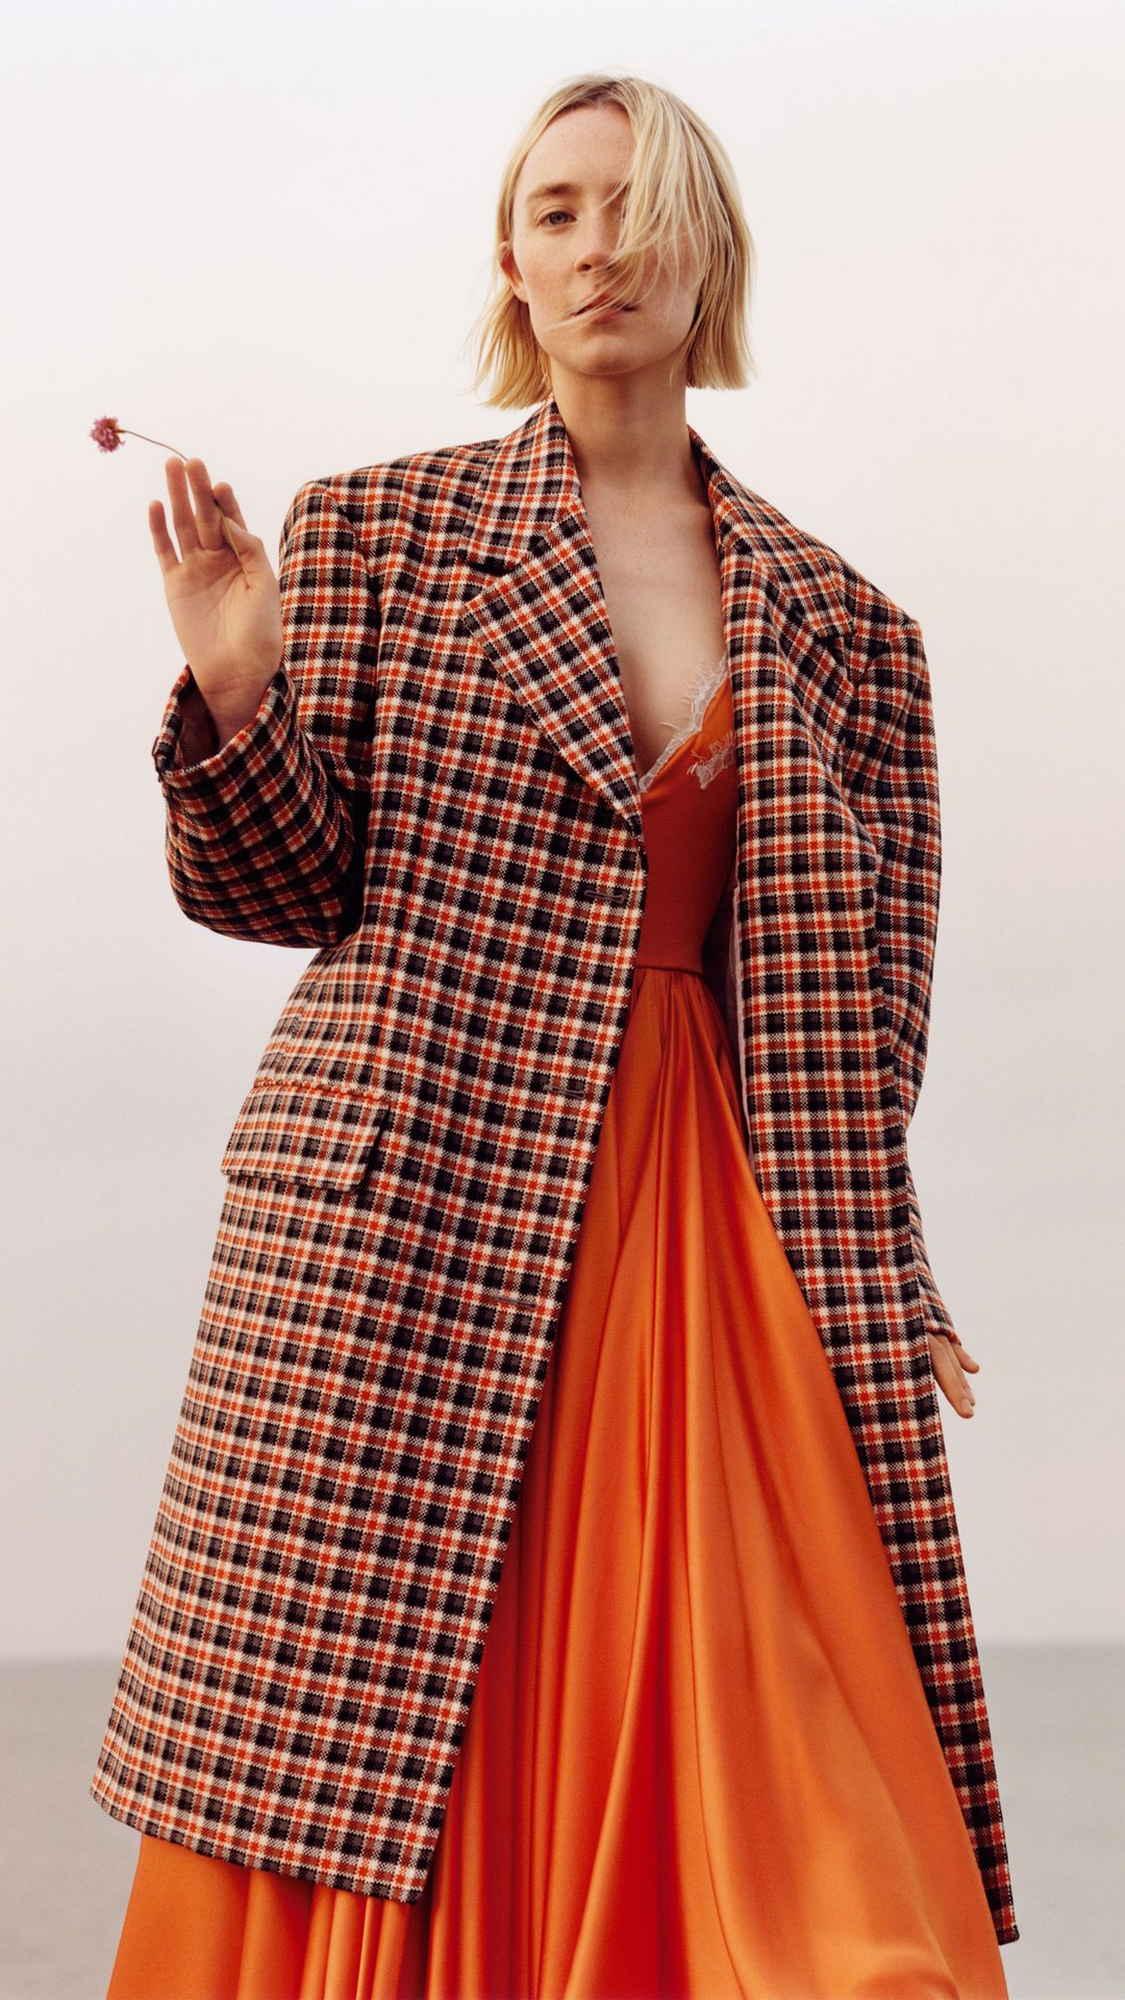 Saoirse-Ronan-US-Vogue-August-201800006.jpg